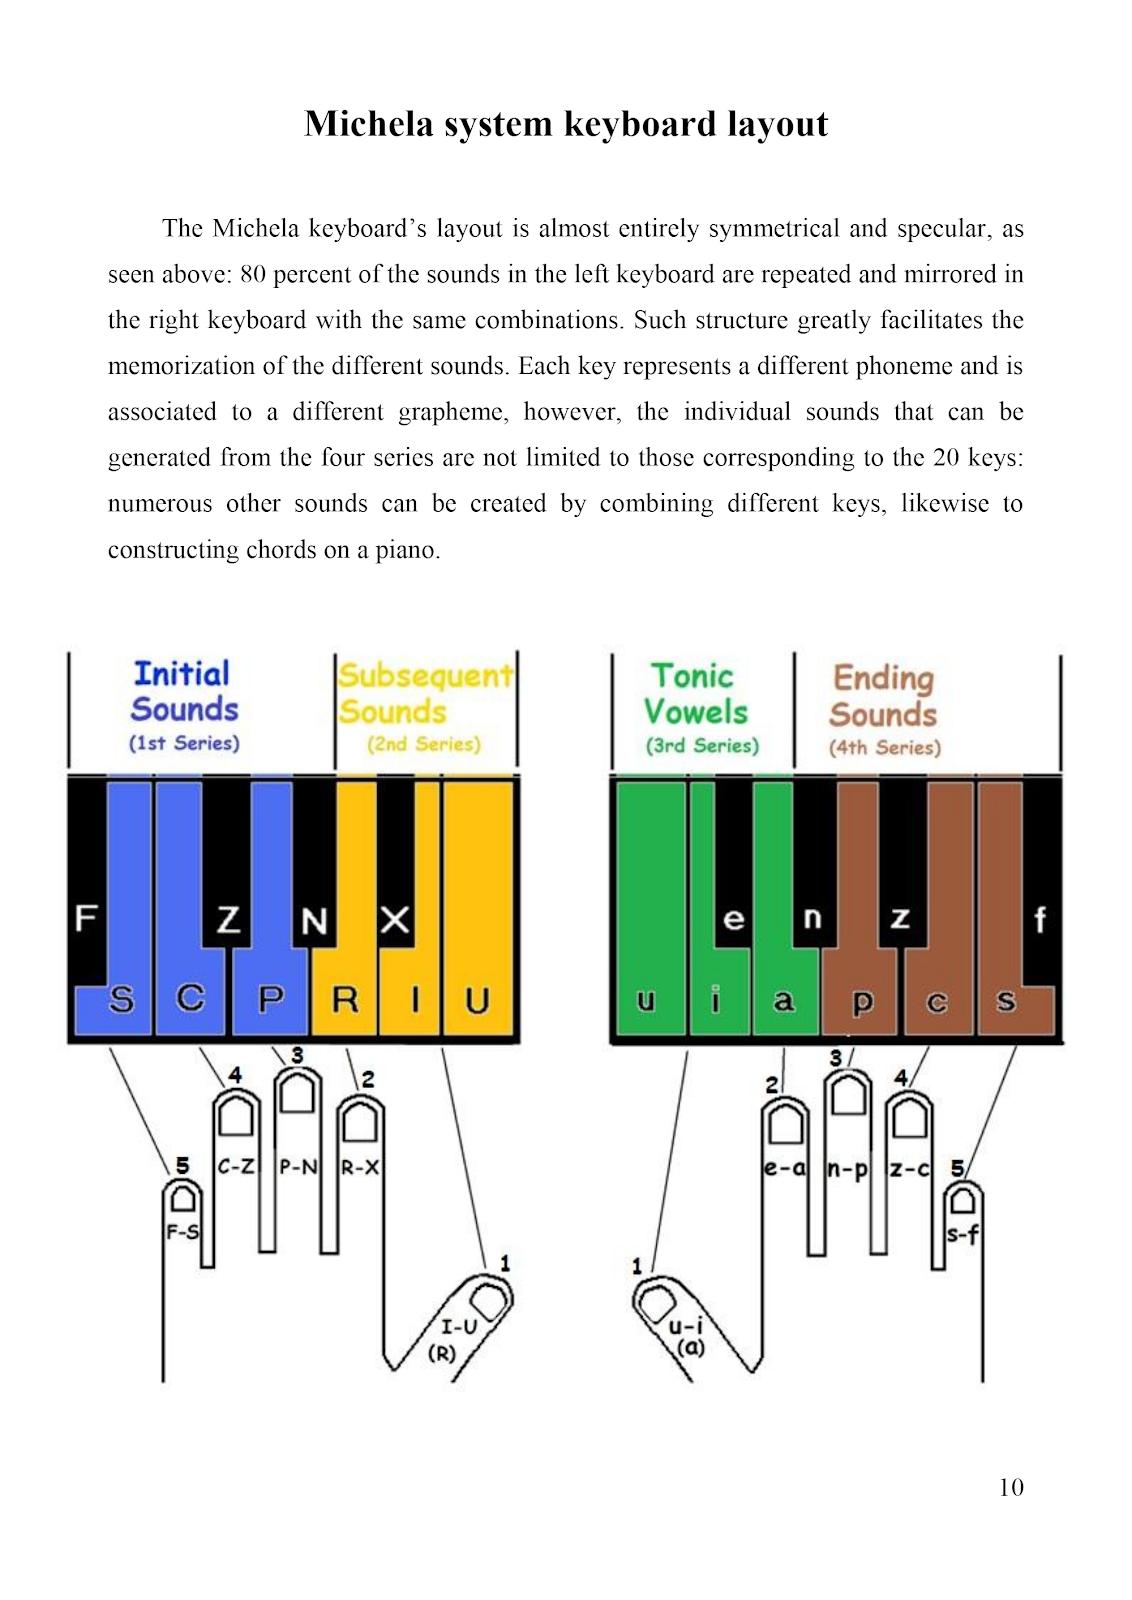 diagram of Michela MIDI keyboard